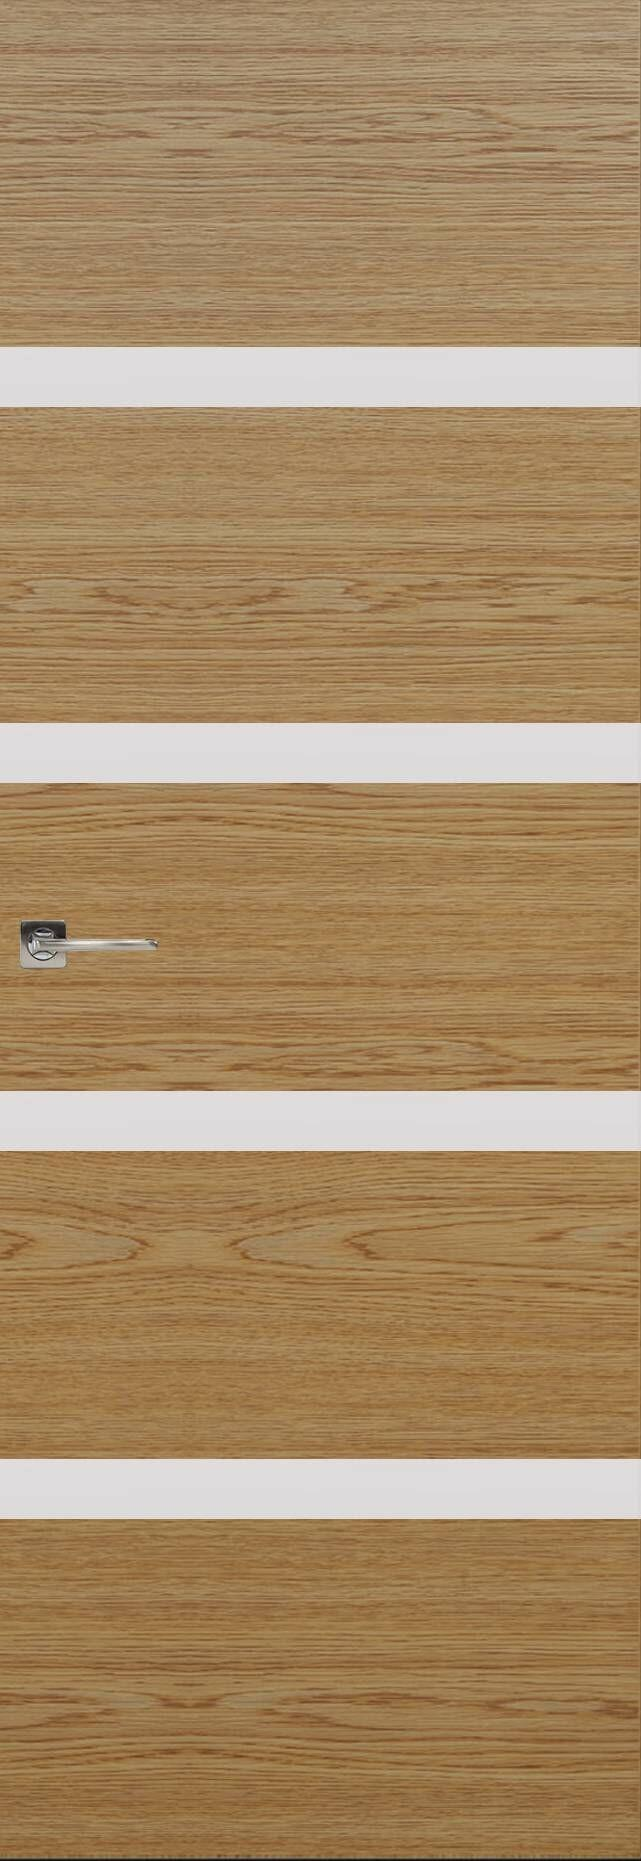 Tivoli Д-4 Невидимка цвет - Дуб карамель Без стекла (ДГ)